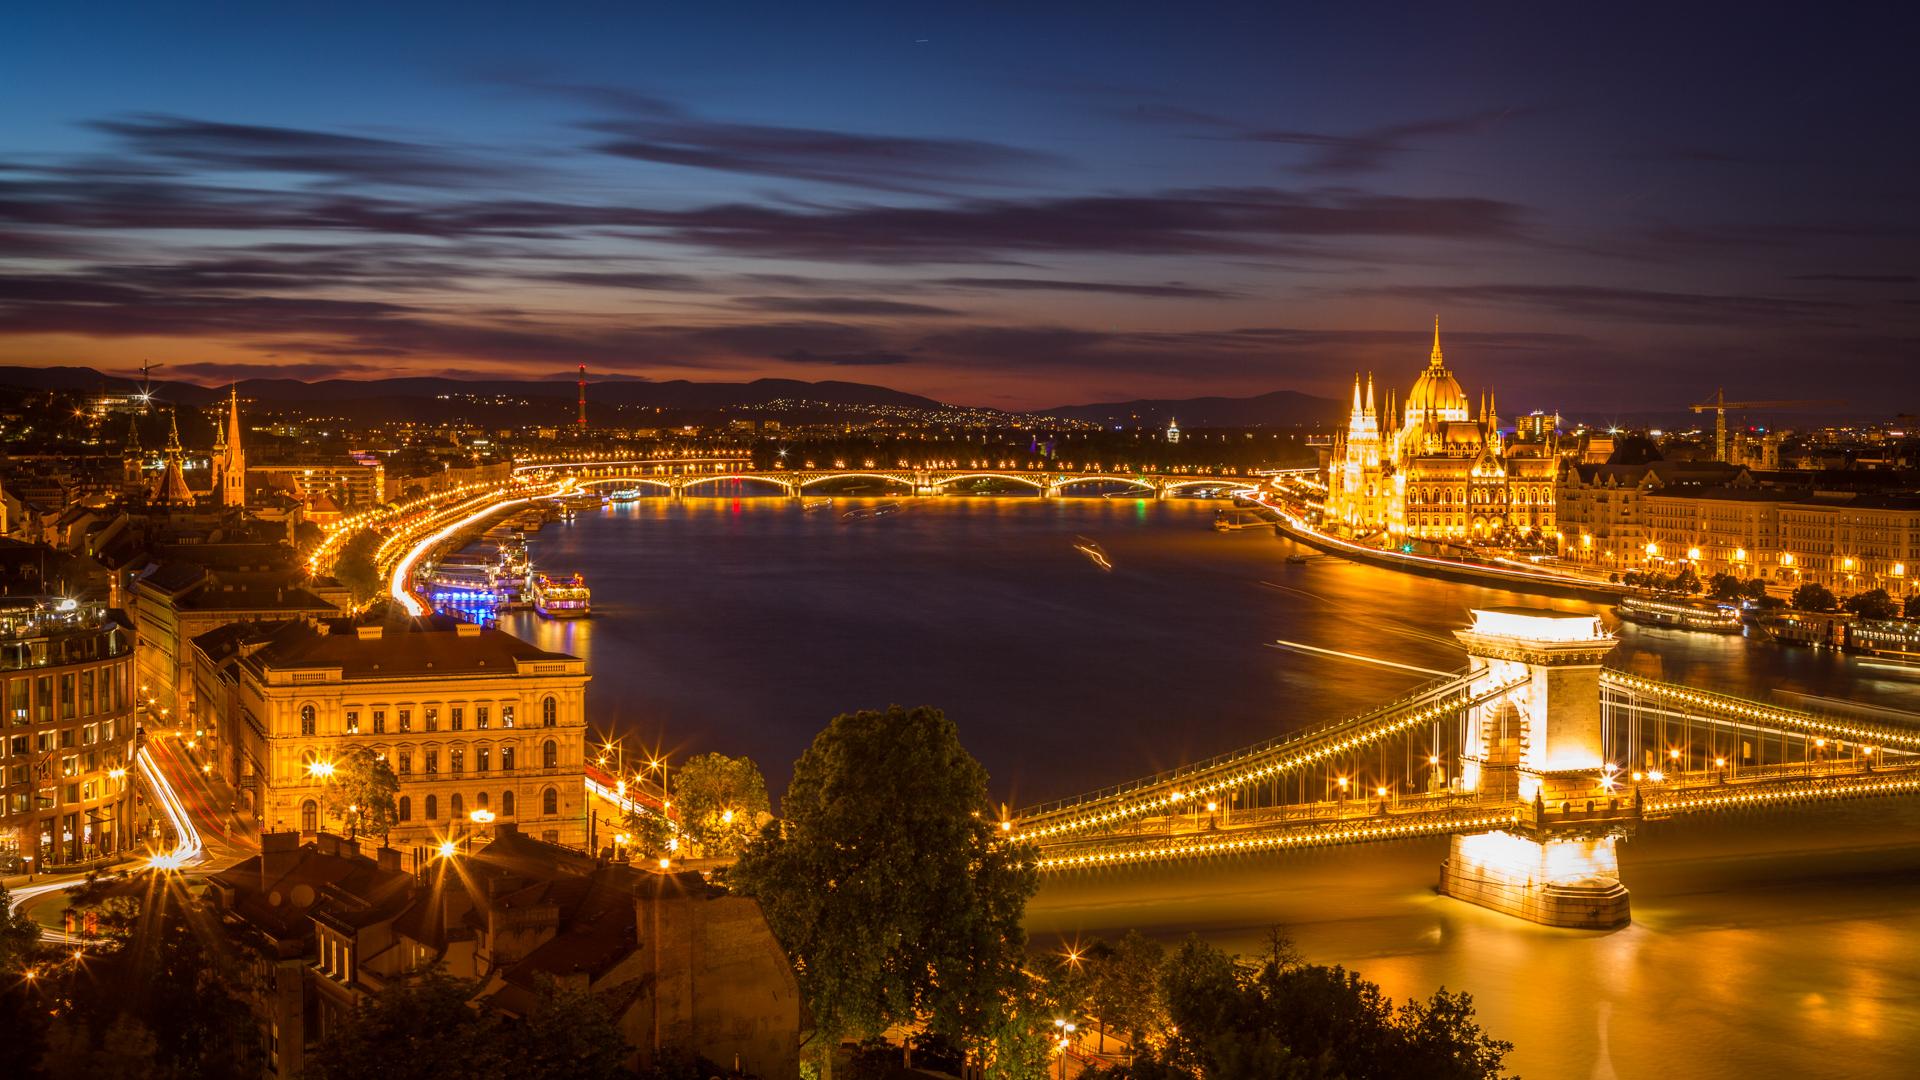 Night view of Budapest, Hungary, Jul 1, 2018